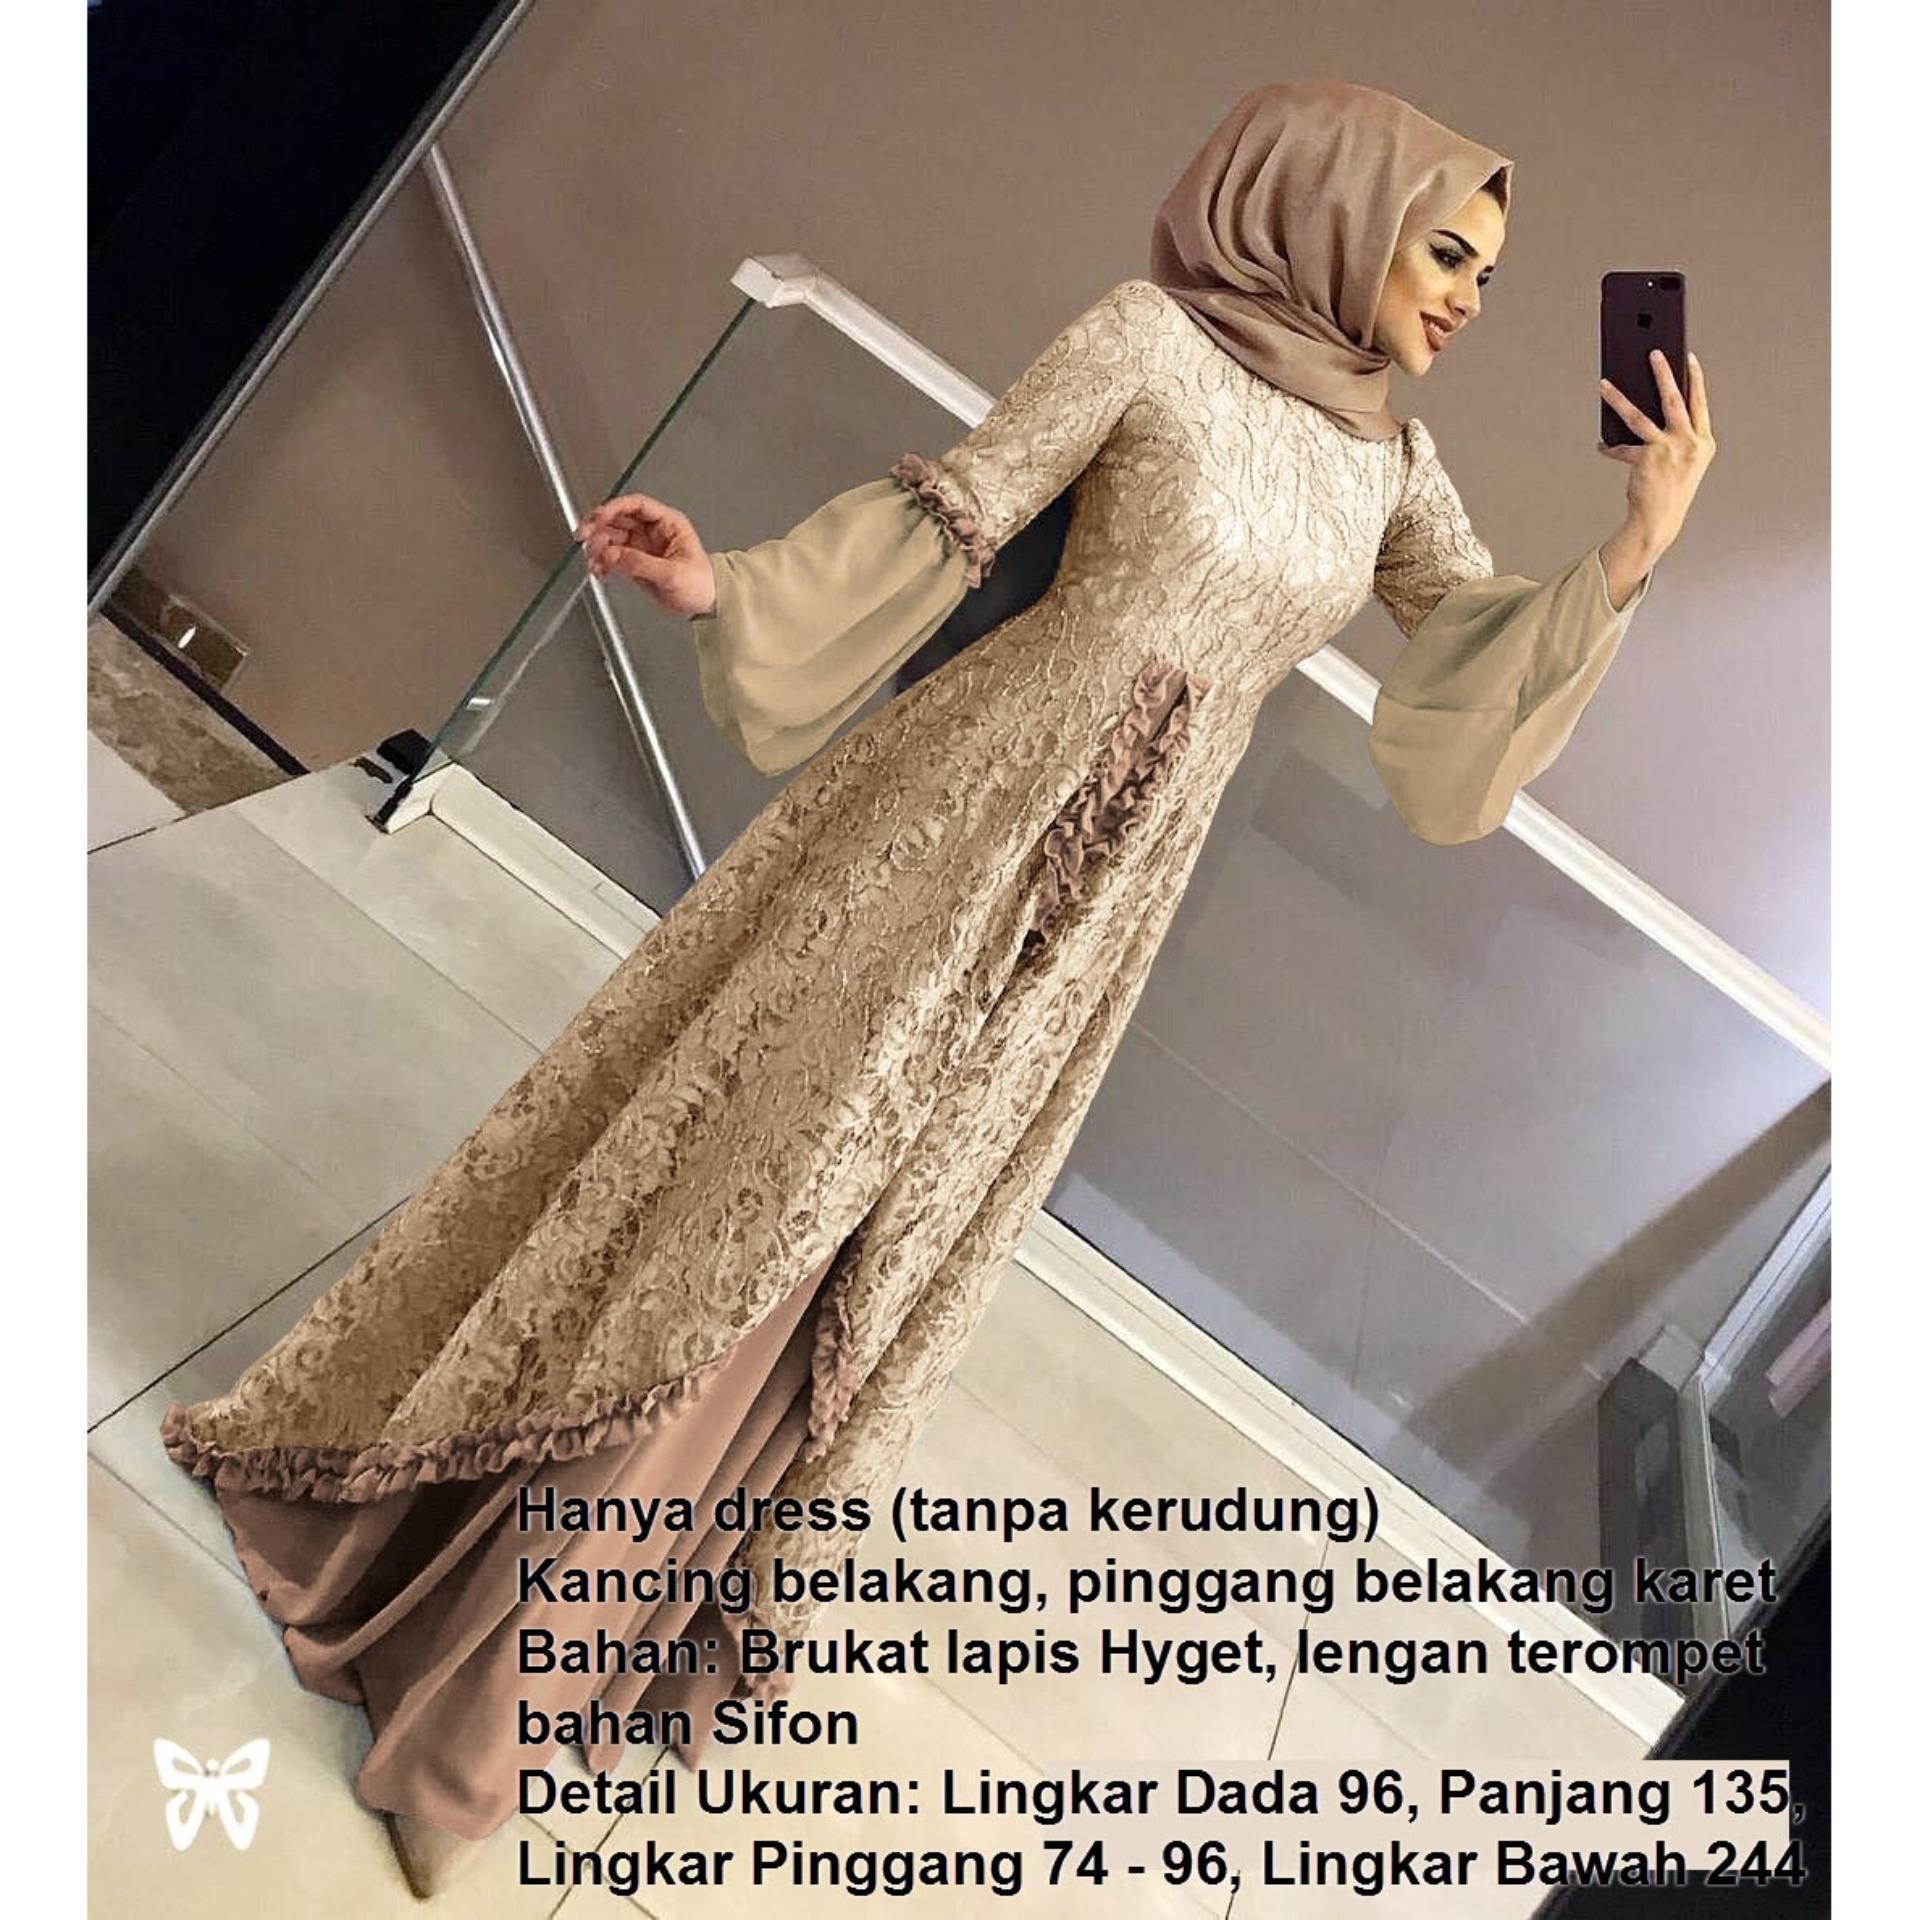 Fine Outlet Maxi Dress Lengan Panjang Brukat Tangan Terompet ( Tanpa Kerudung ) MFT100 / Gamis Syari / Gaun Pesta Muslimah / Baju Muslim Wanita Syar'i / Kebaya Modern Brokat / Pakaian Hijab / Srjuliette